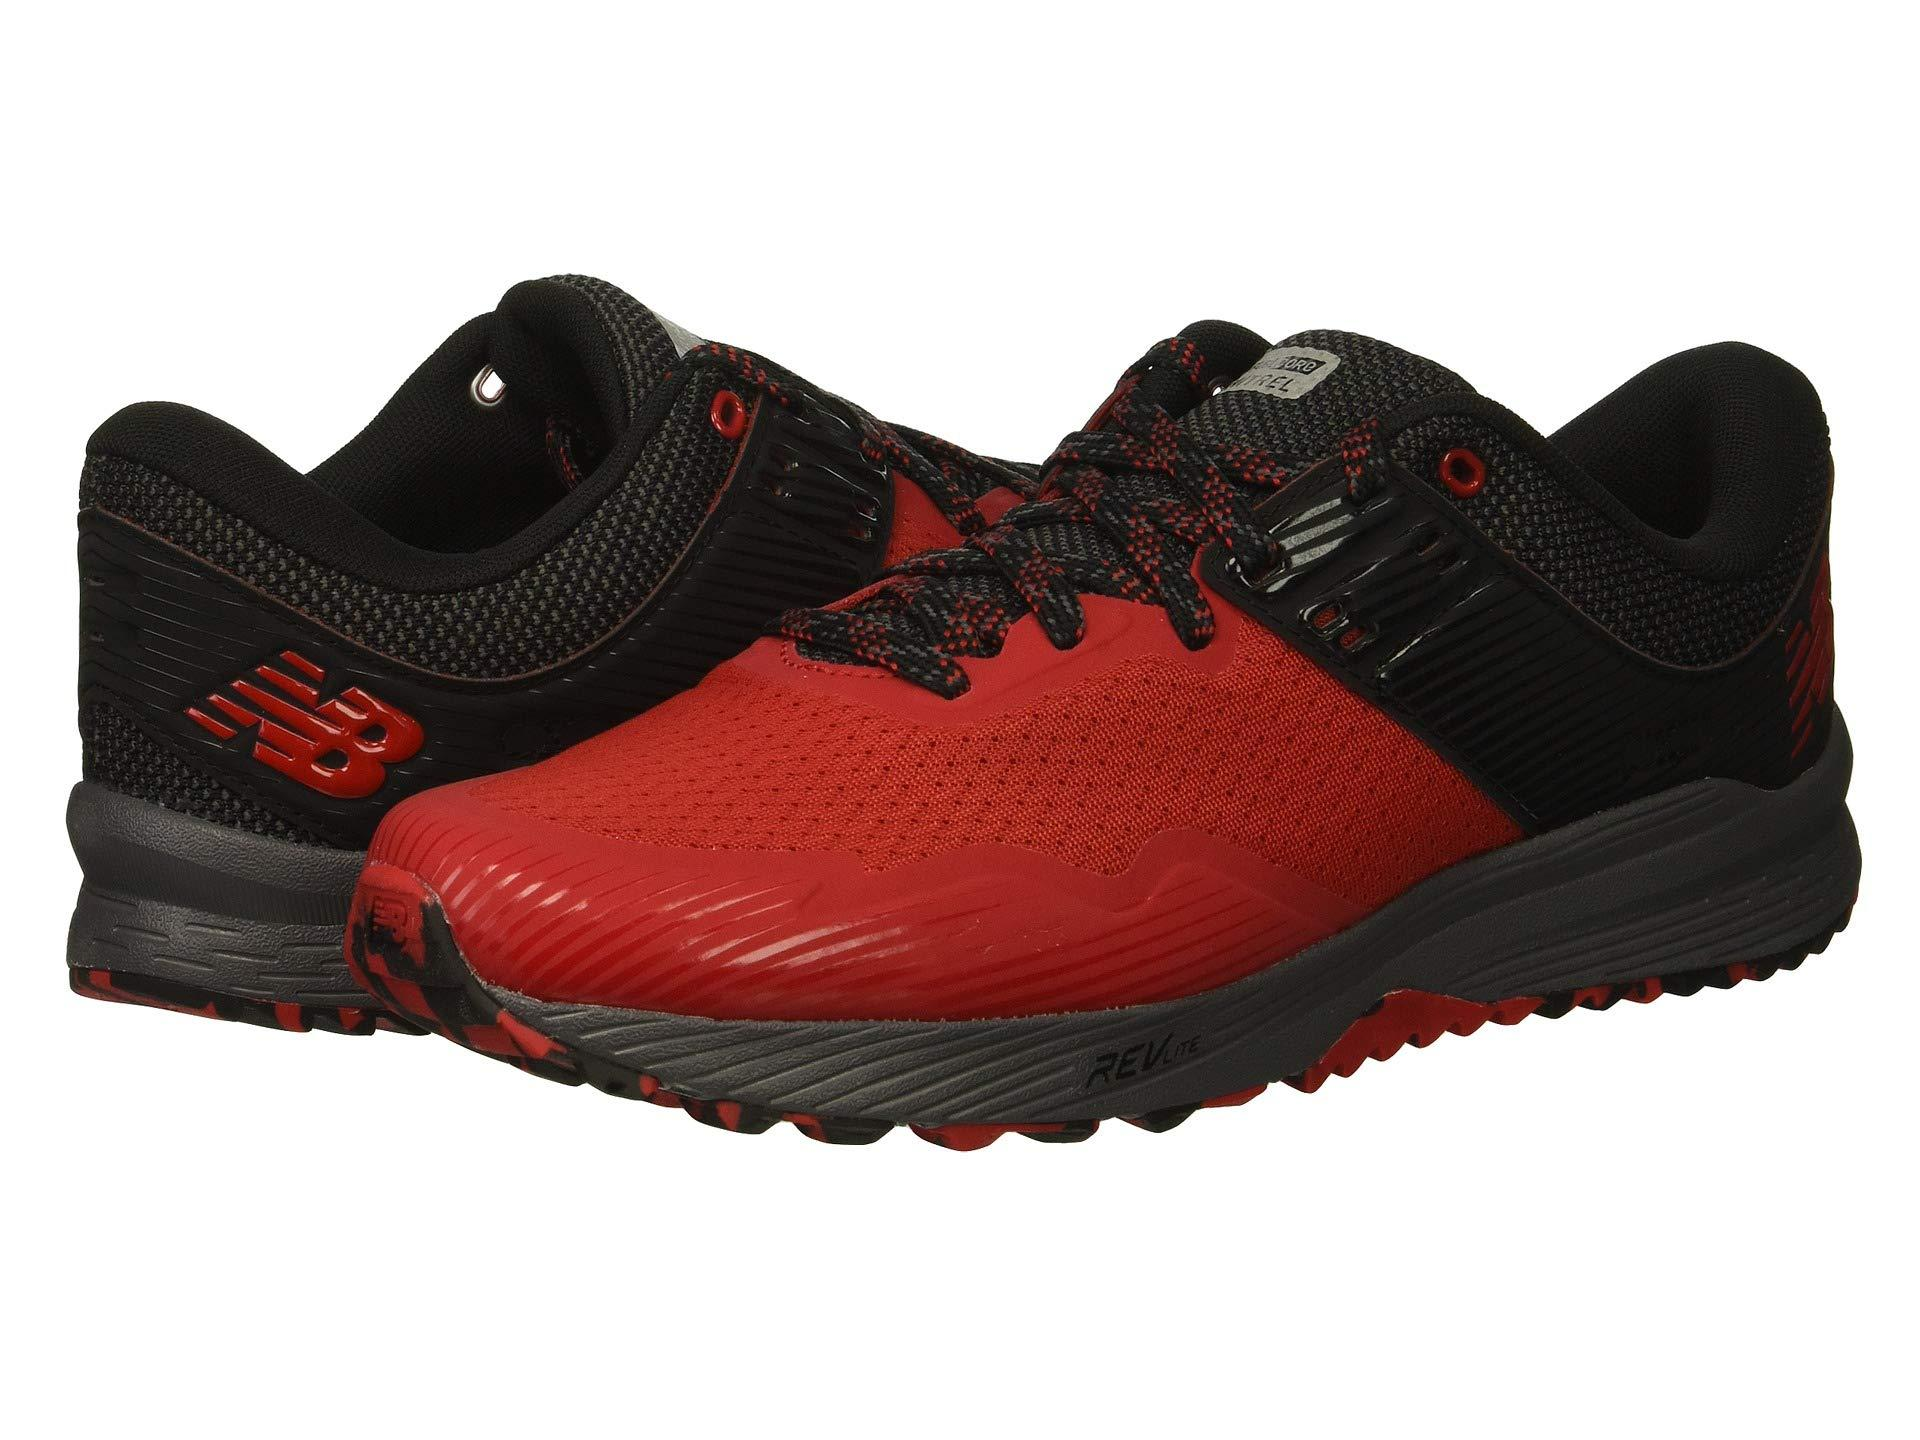 425aafbc48 Men's Red Nitrel Trail V2 Trail Shoes